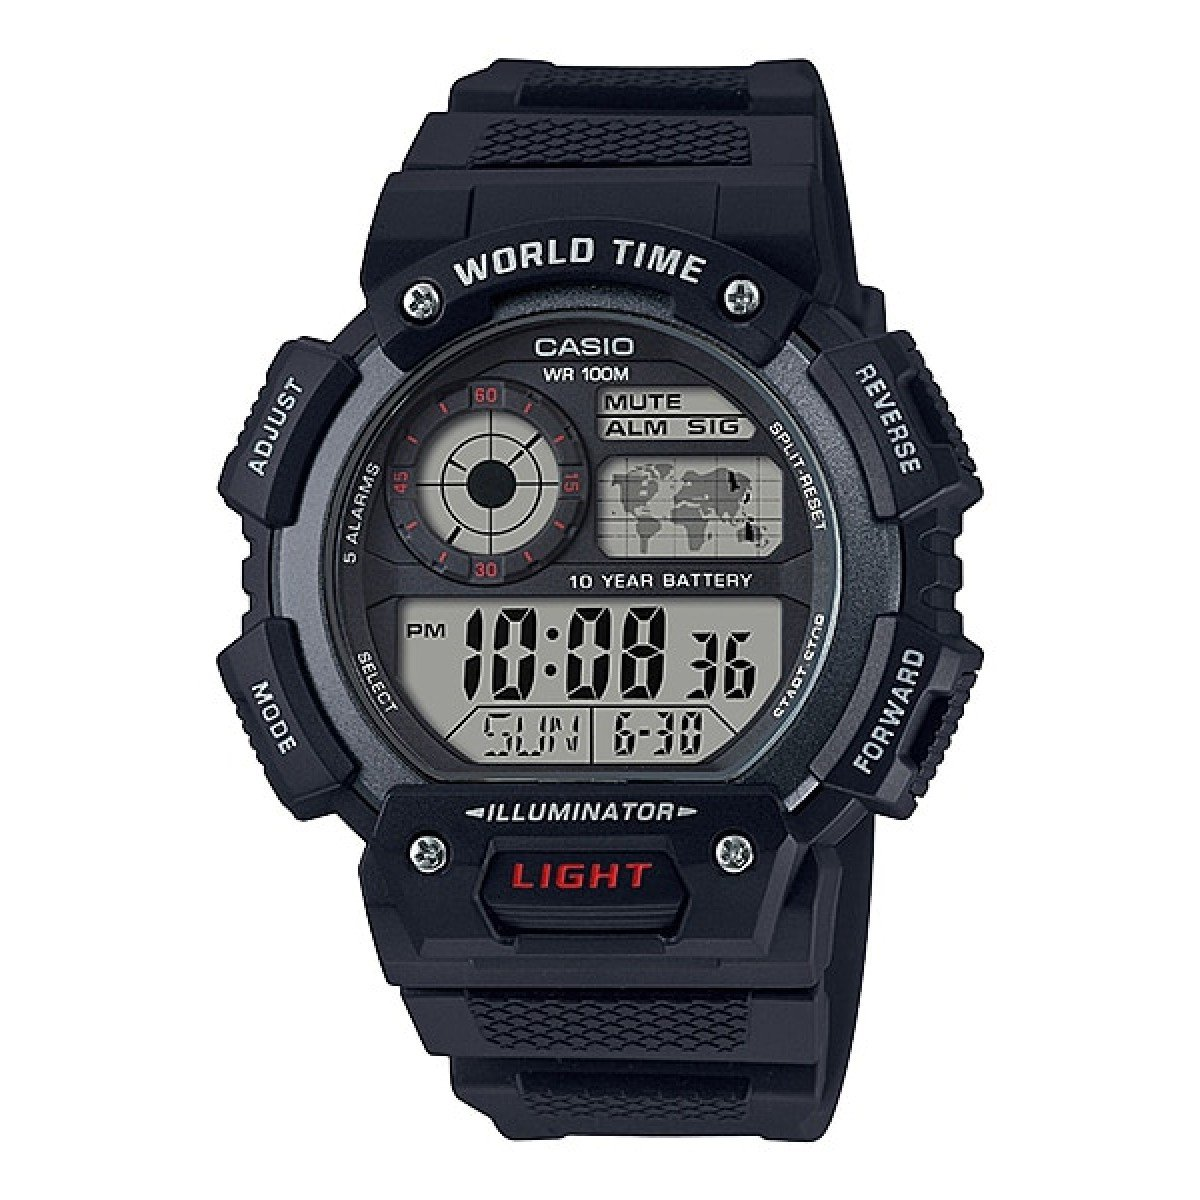 Reloj Casio Quartz Alarms Mens Watch AE-1400WH-1AV